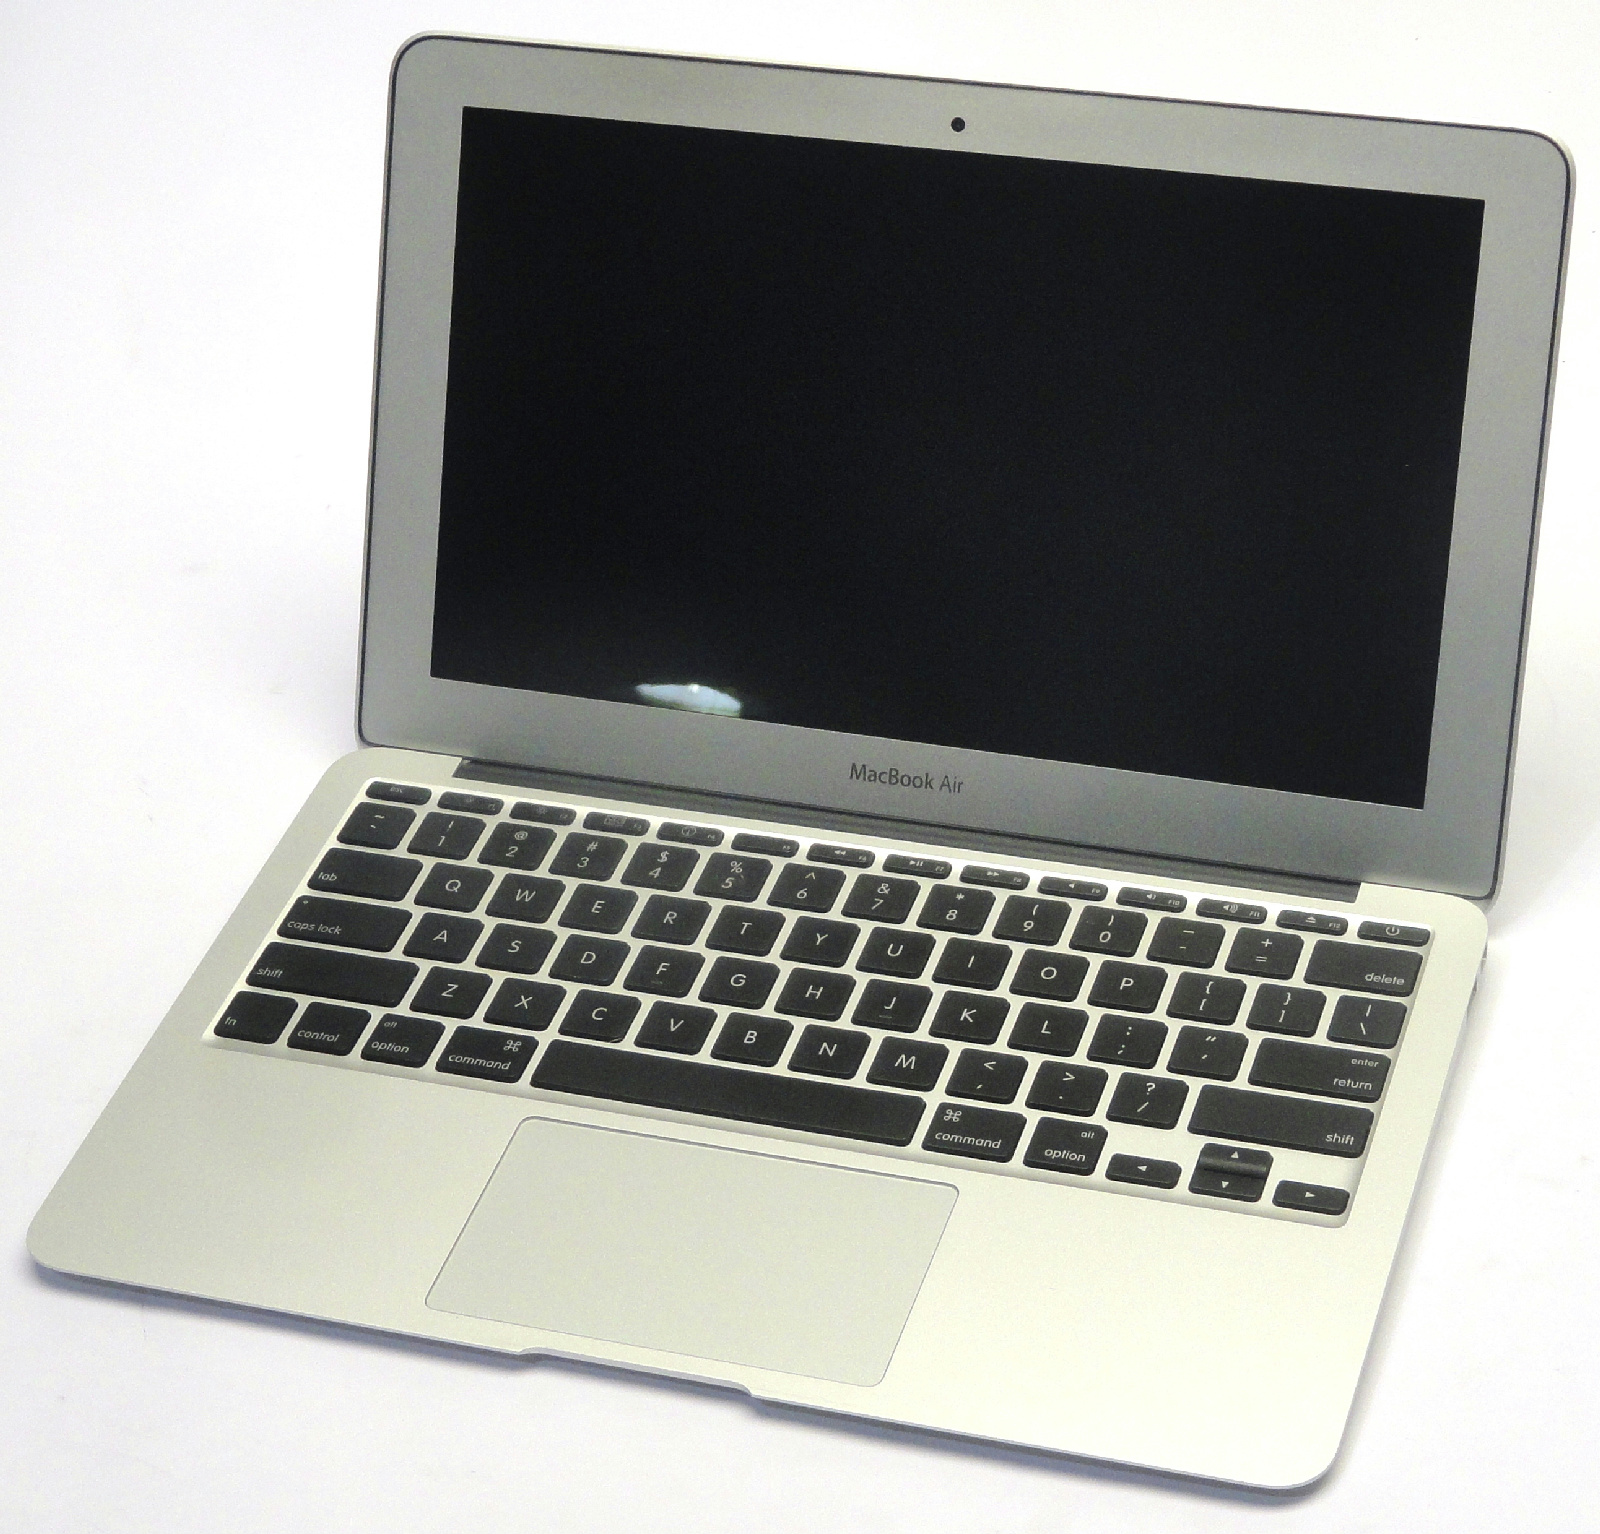 apple macbook air a1370 2010 11 6 laptop core. Black Bedroom Furniture Sets. Home Design Ideas